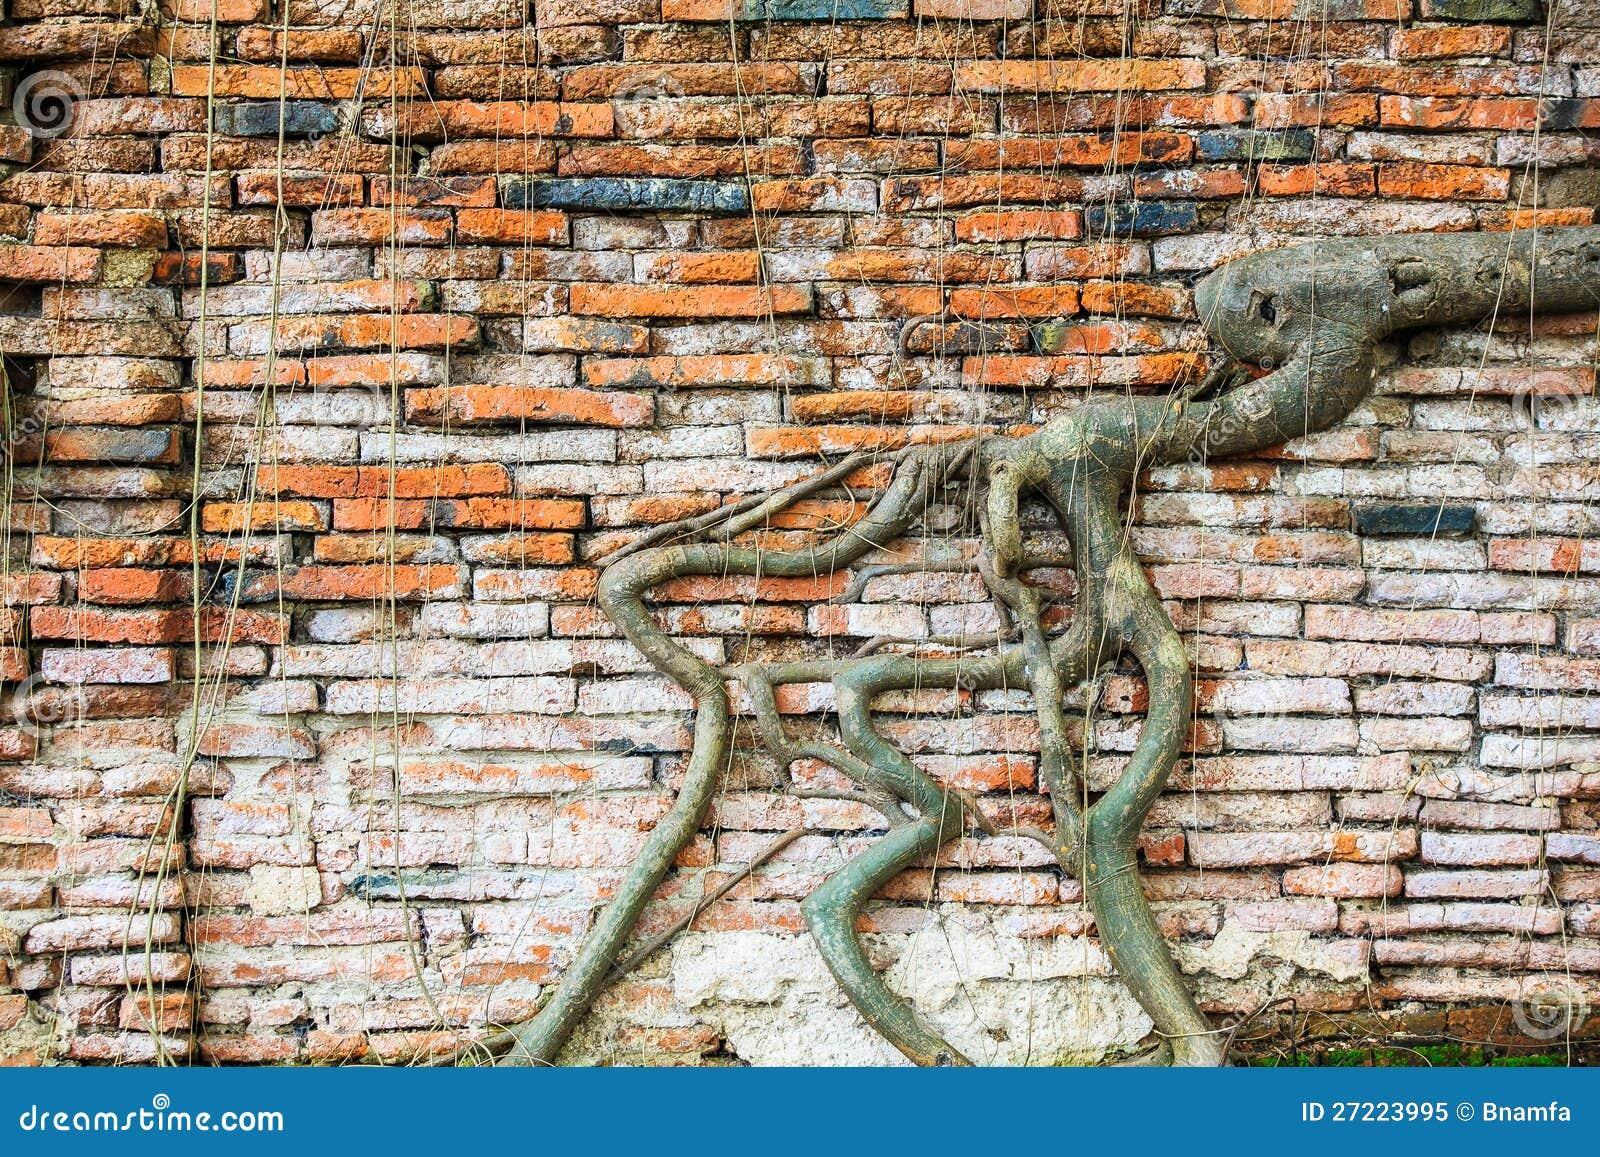 old  ragged brick wall texture royalty free stock photo